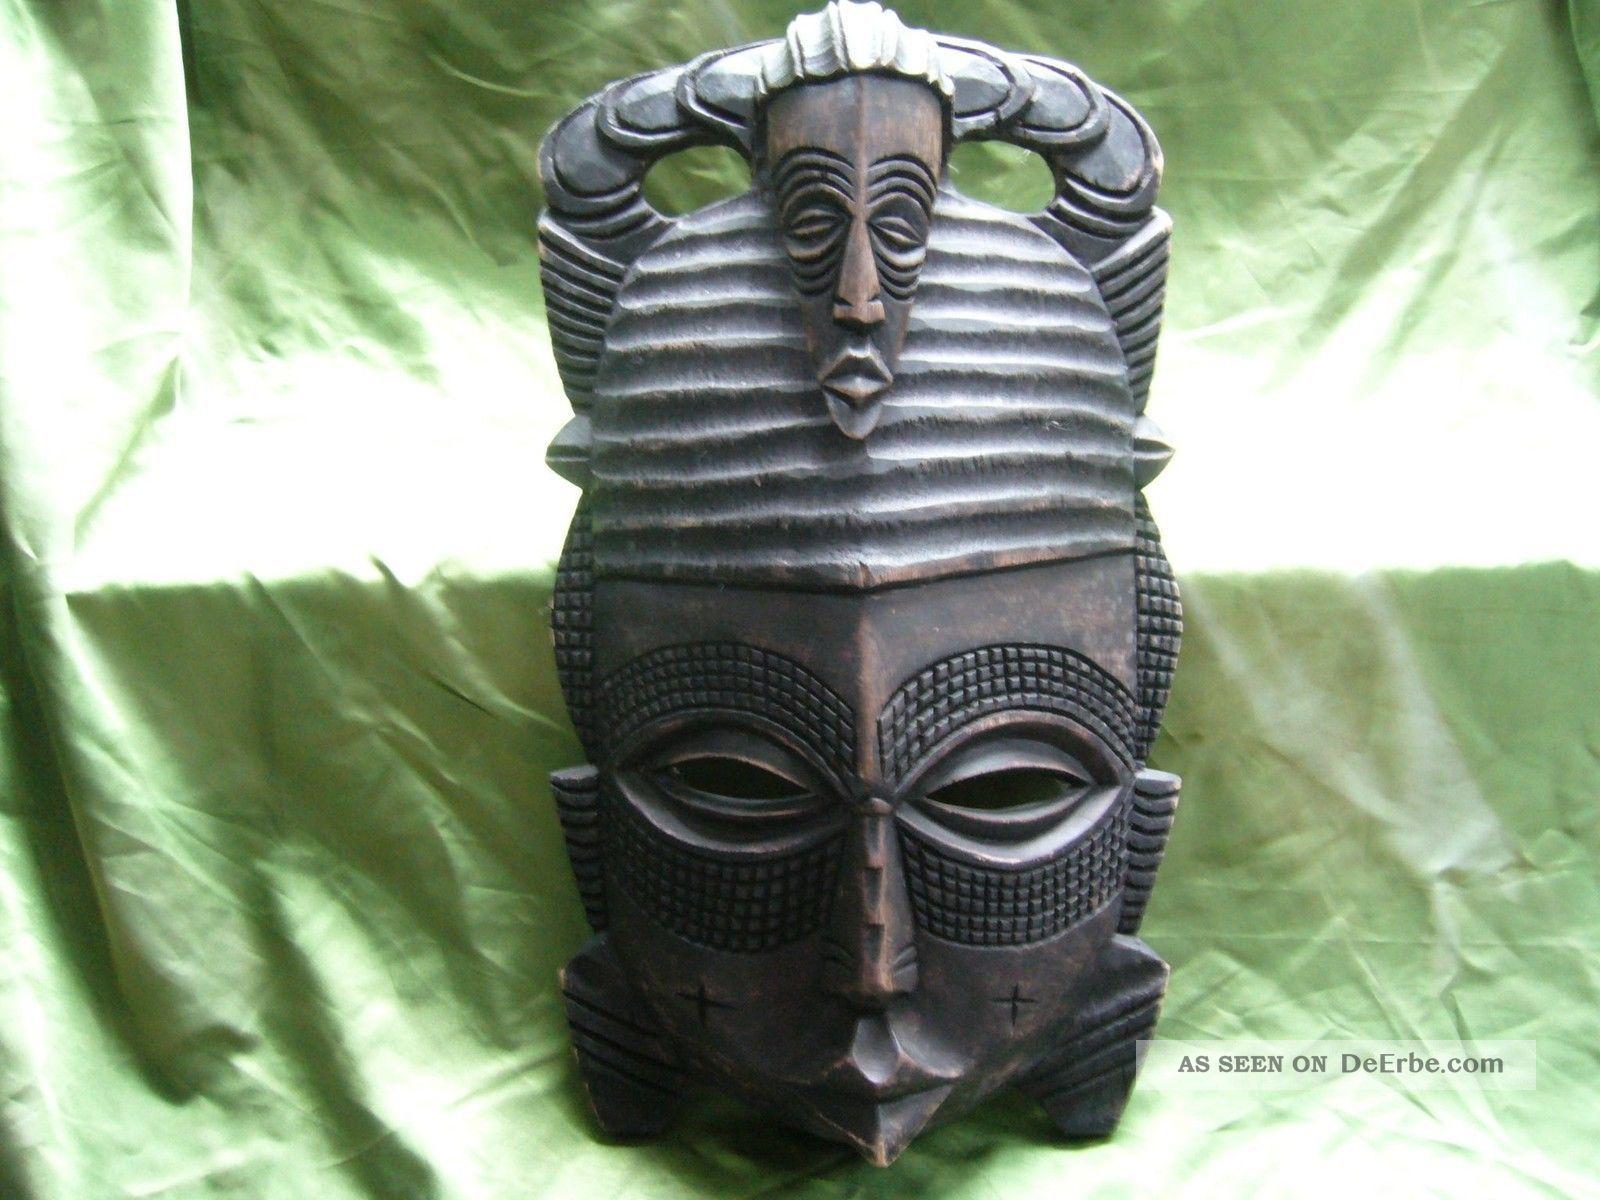 Afrika wandmaske holzmaske dekoration bersee inseln - Dekoration afrika ...